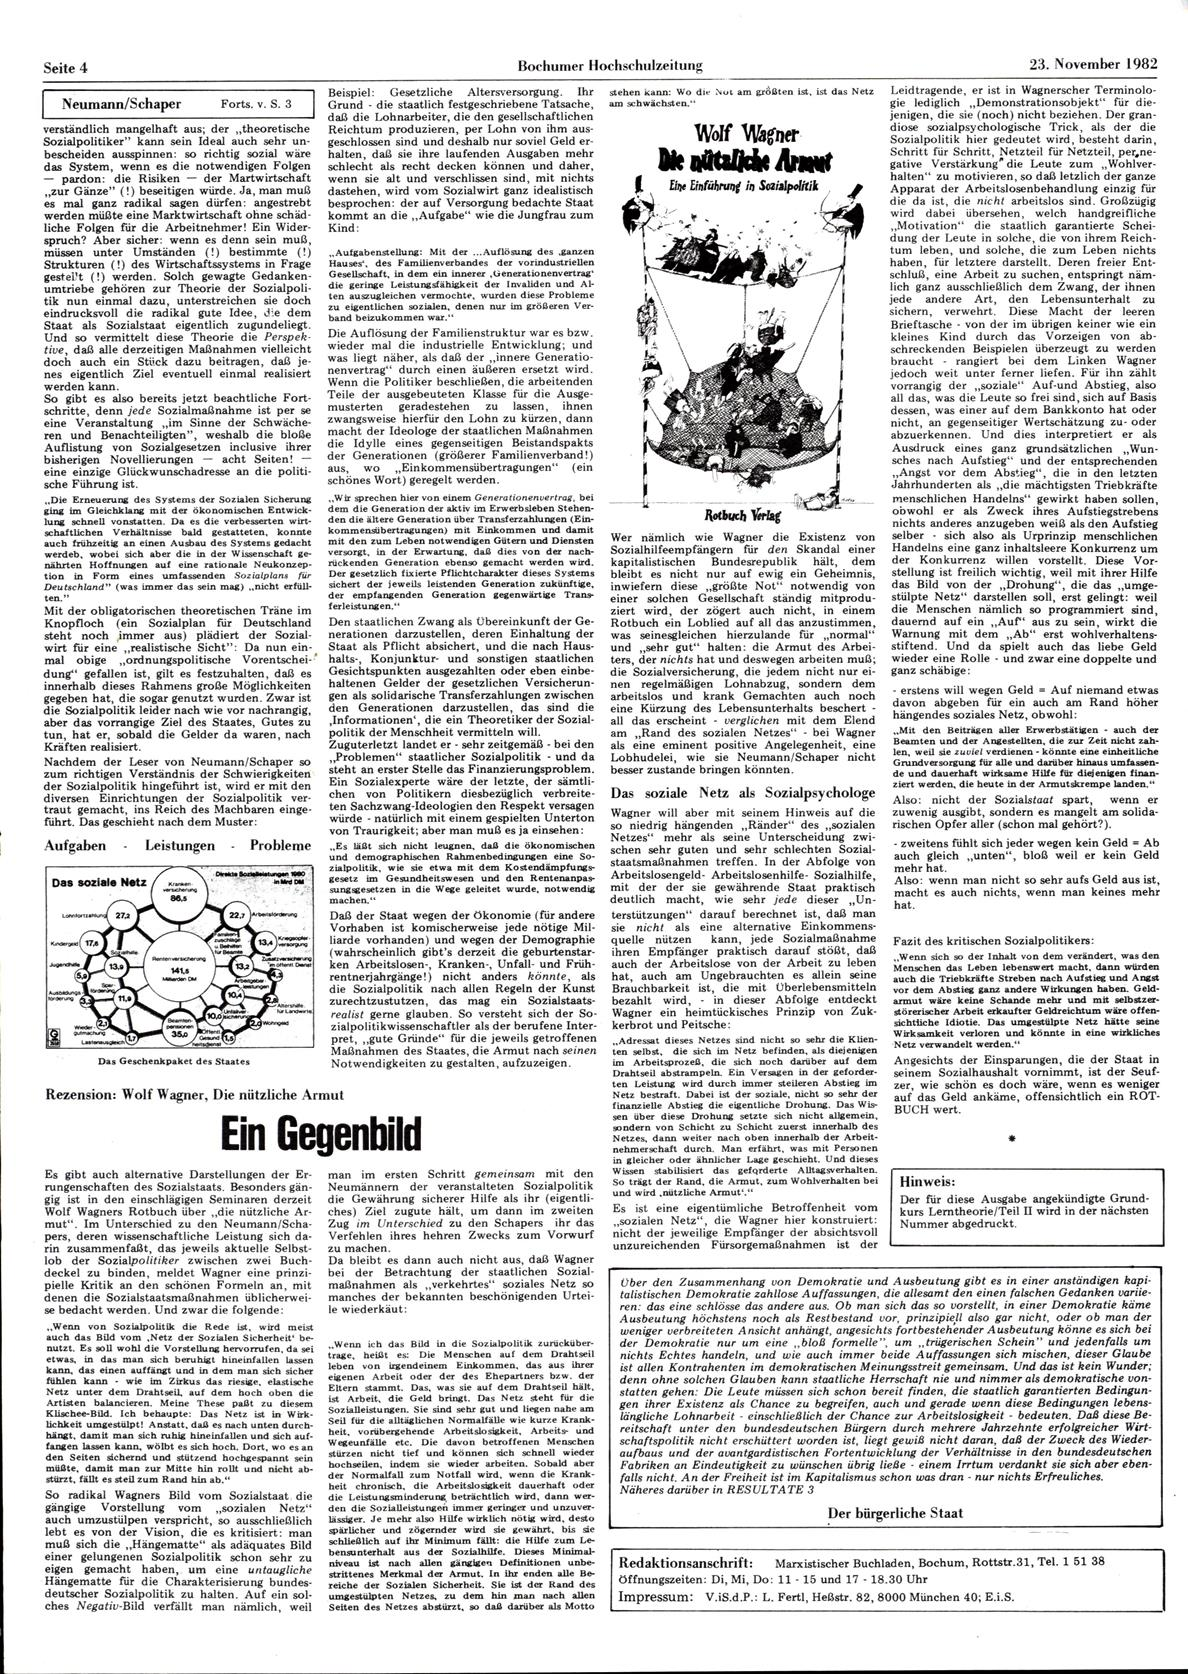 Bochum_BHZ_19821123_060_004